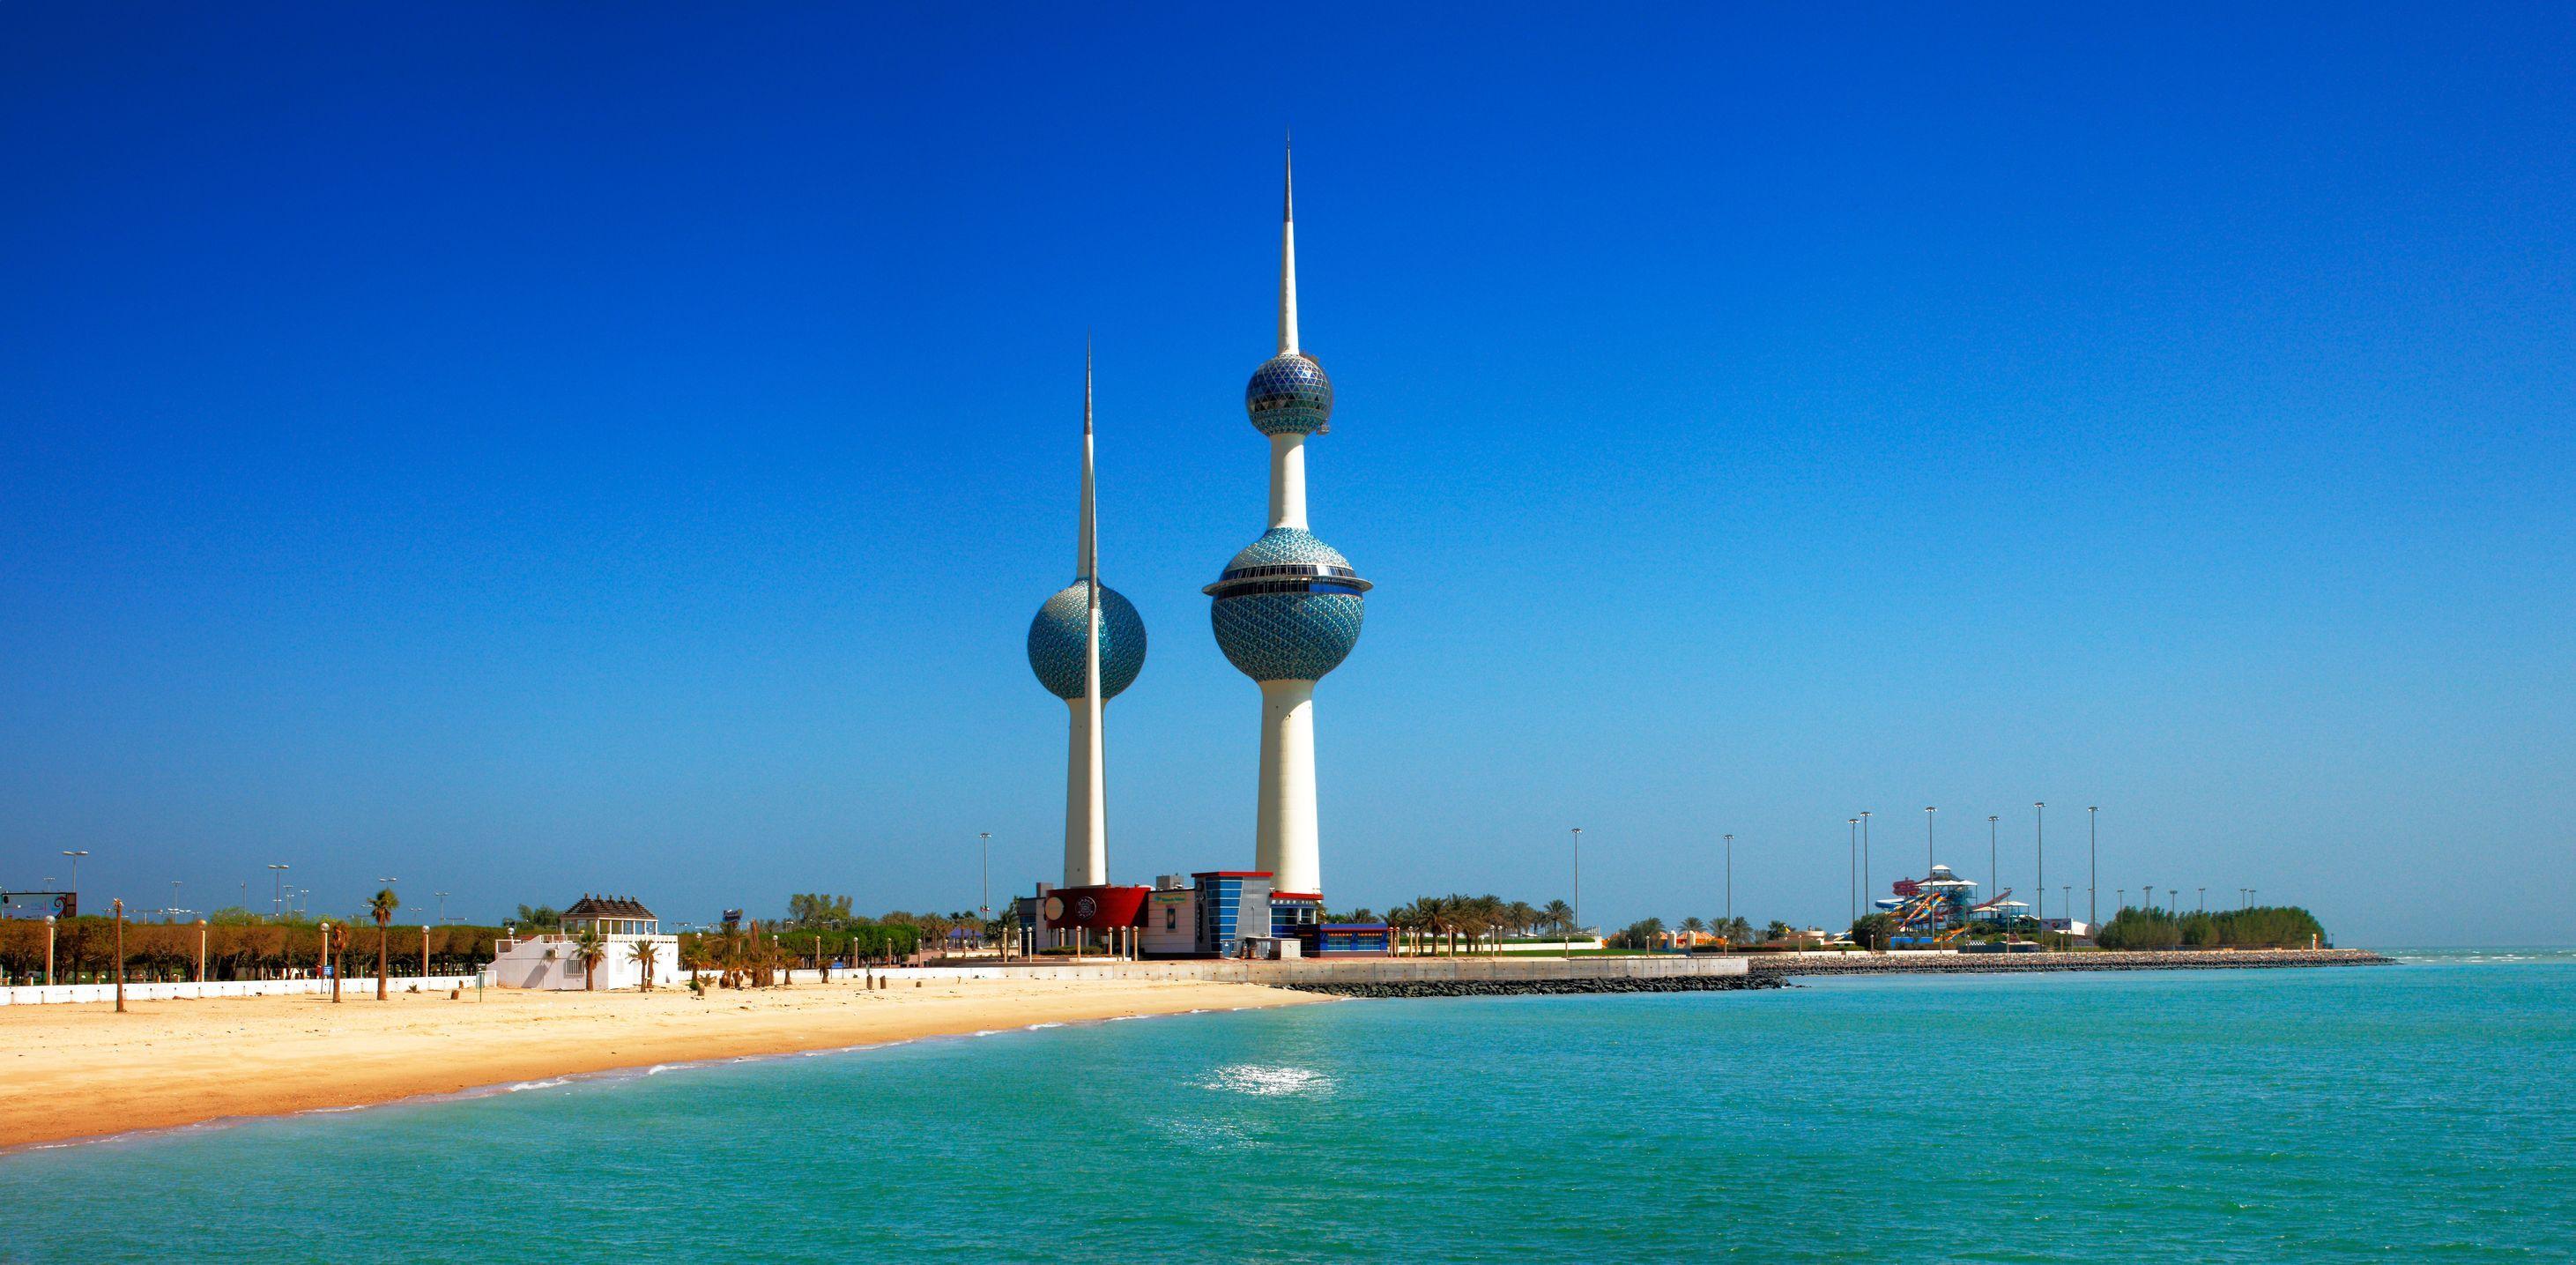 Kuwait City Guide The Old Souk Radisson Blu Blog Kuwait City City Guide Kuwait